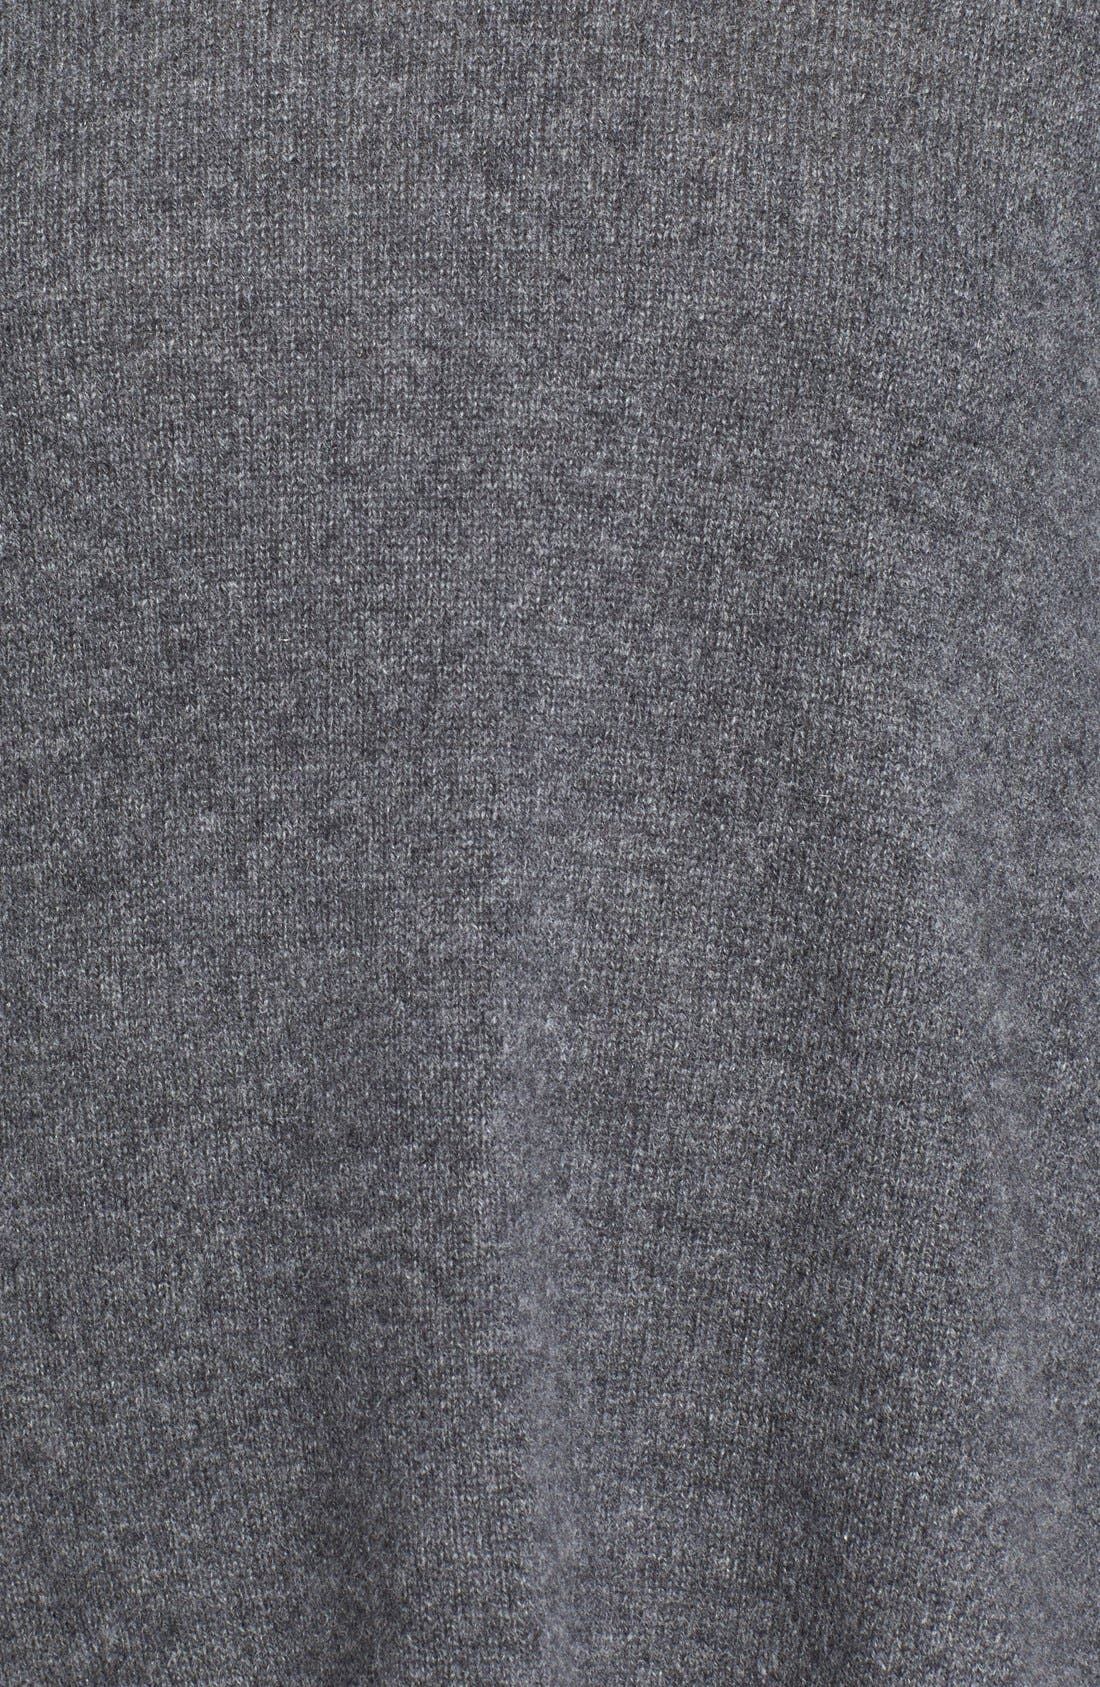 'Ahiga' Turtleneck Sweater,                             Alternate thumbnail 3, color,                             Medium Grey